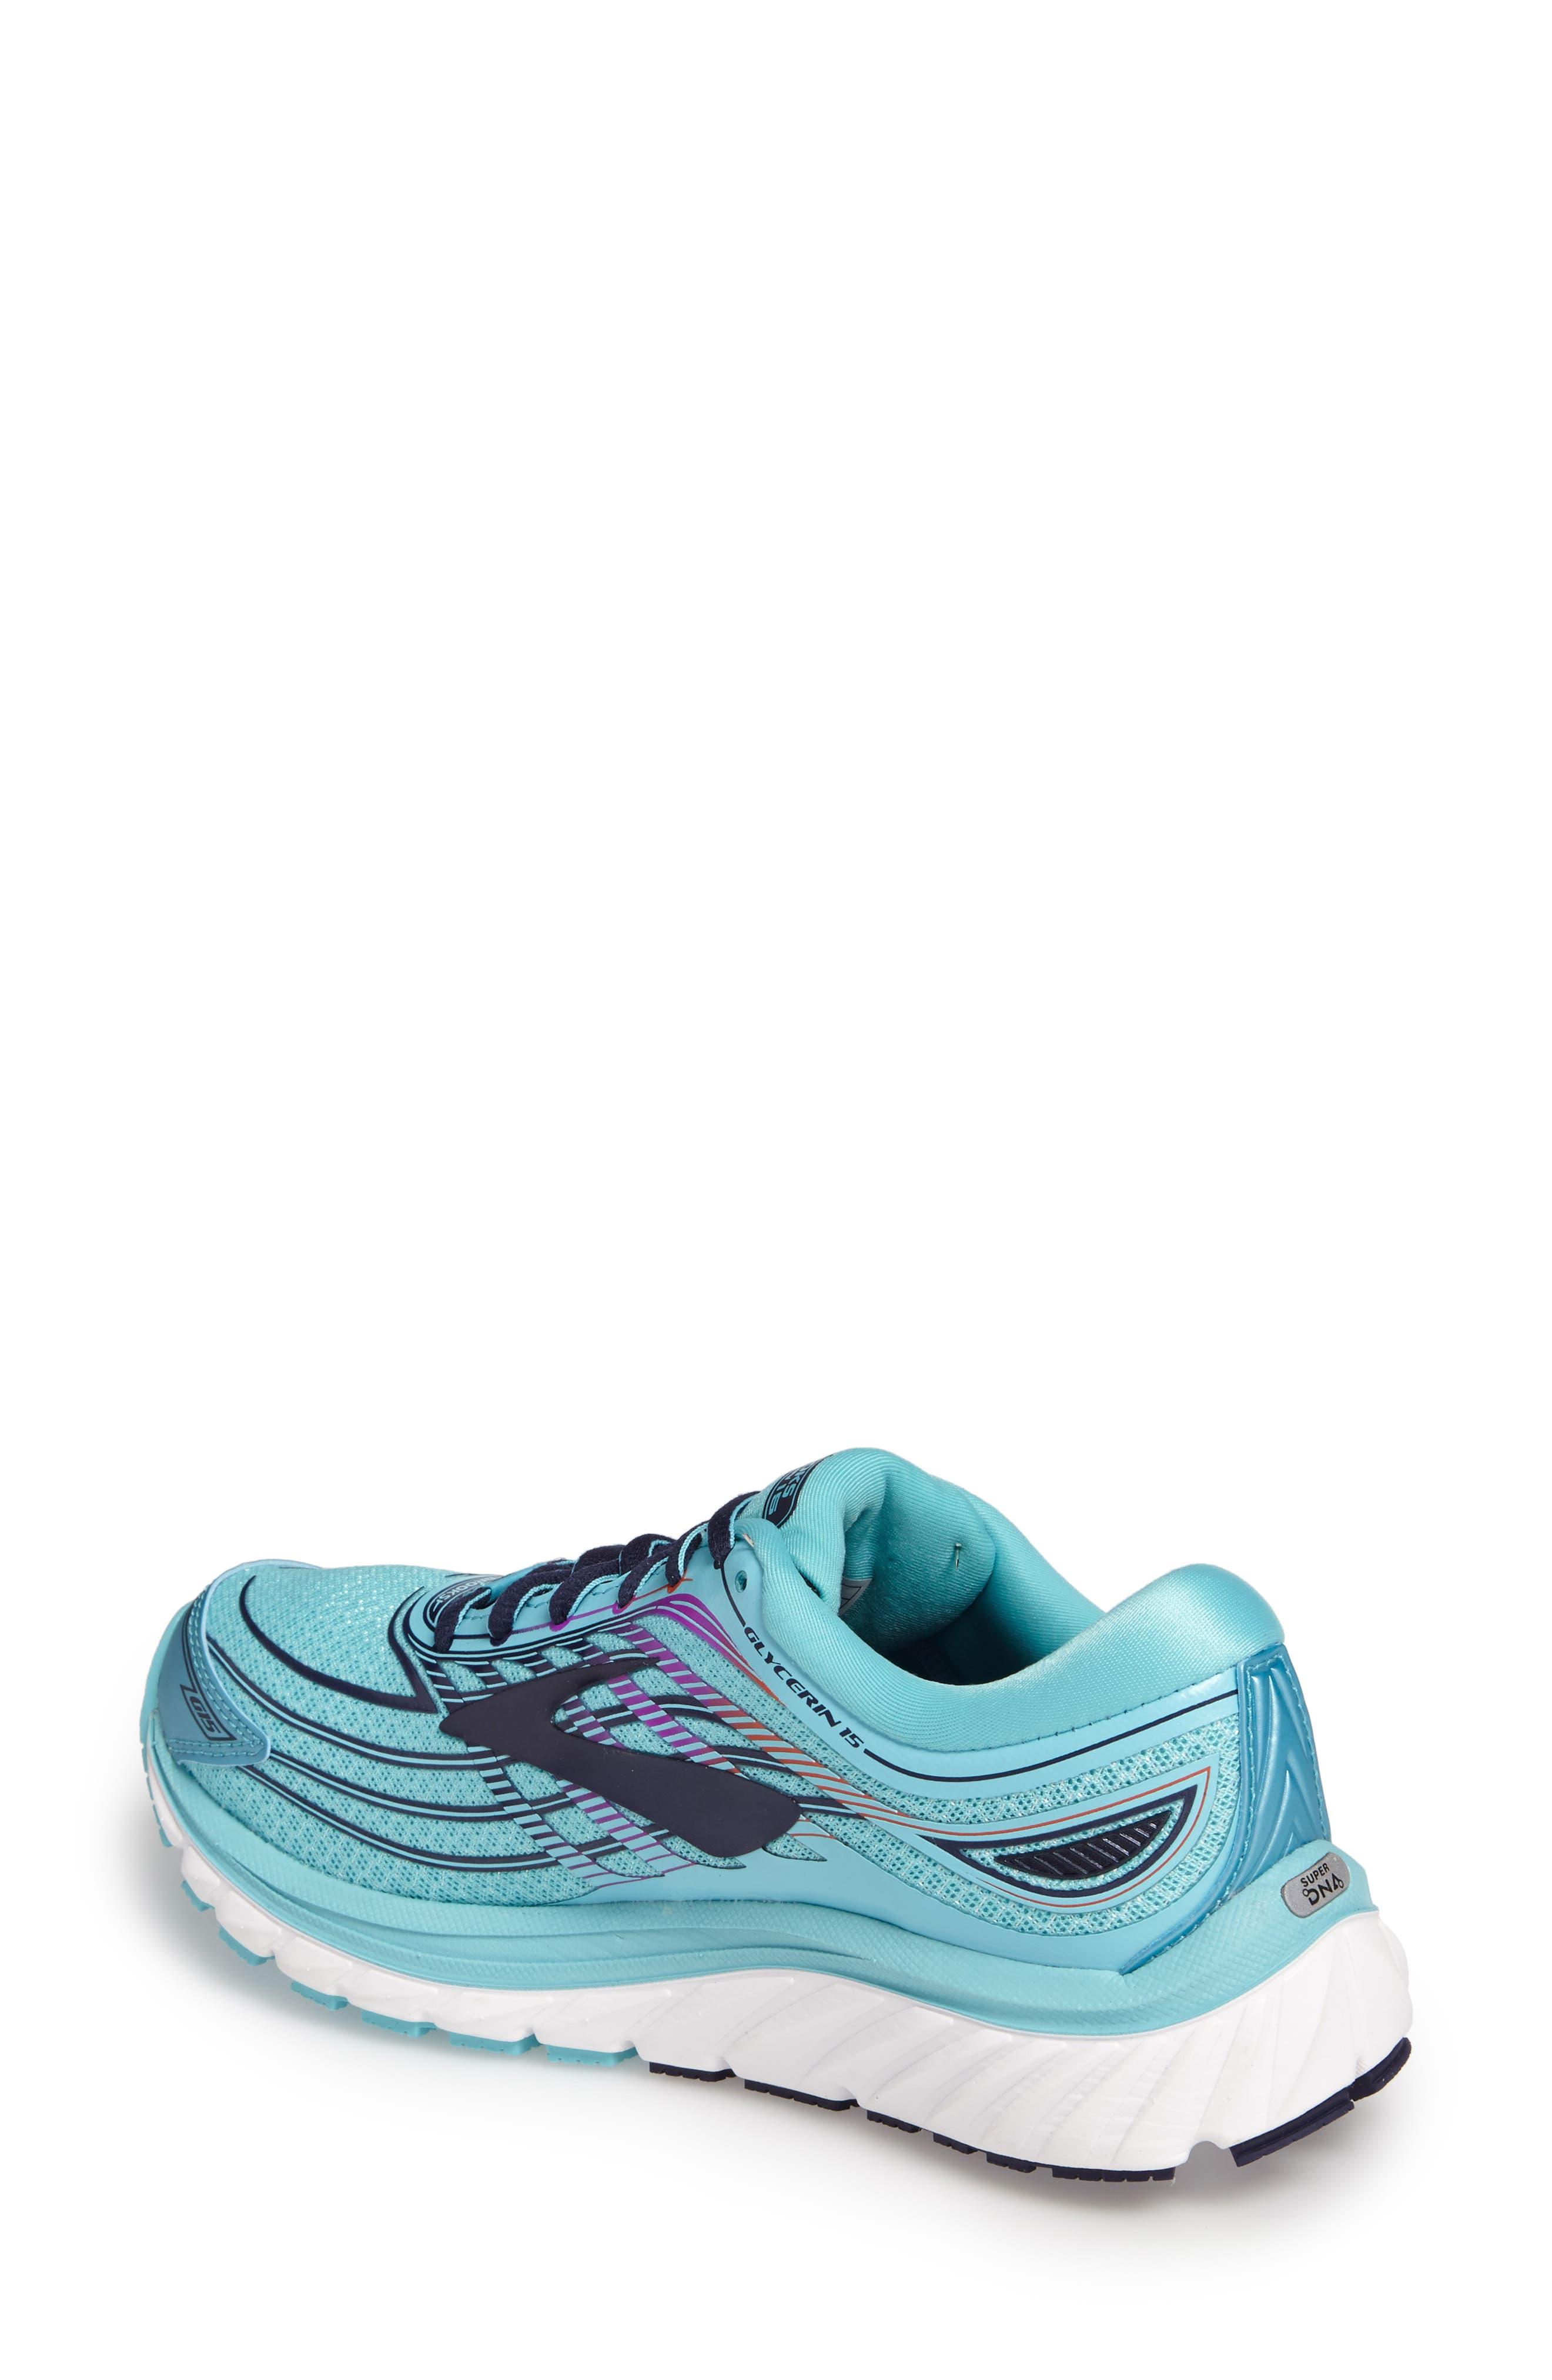 Alternate Image 2  - Brooks Glycerin 15 Running Shoe (Women)